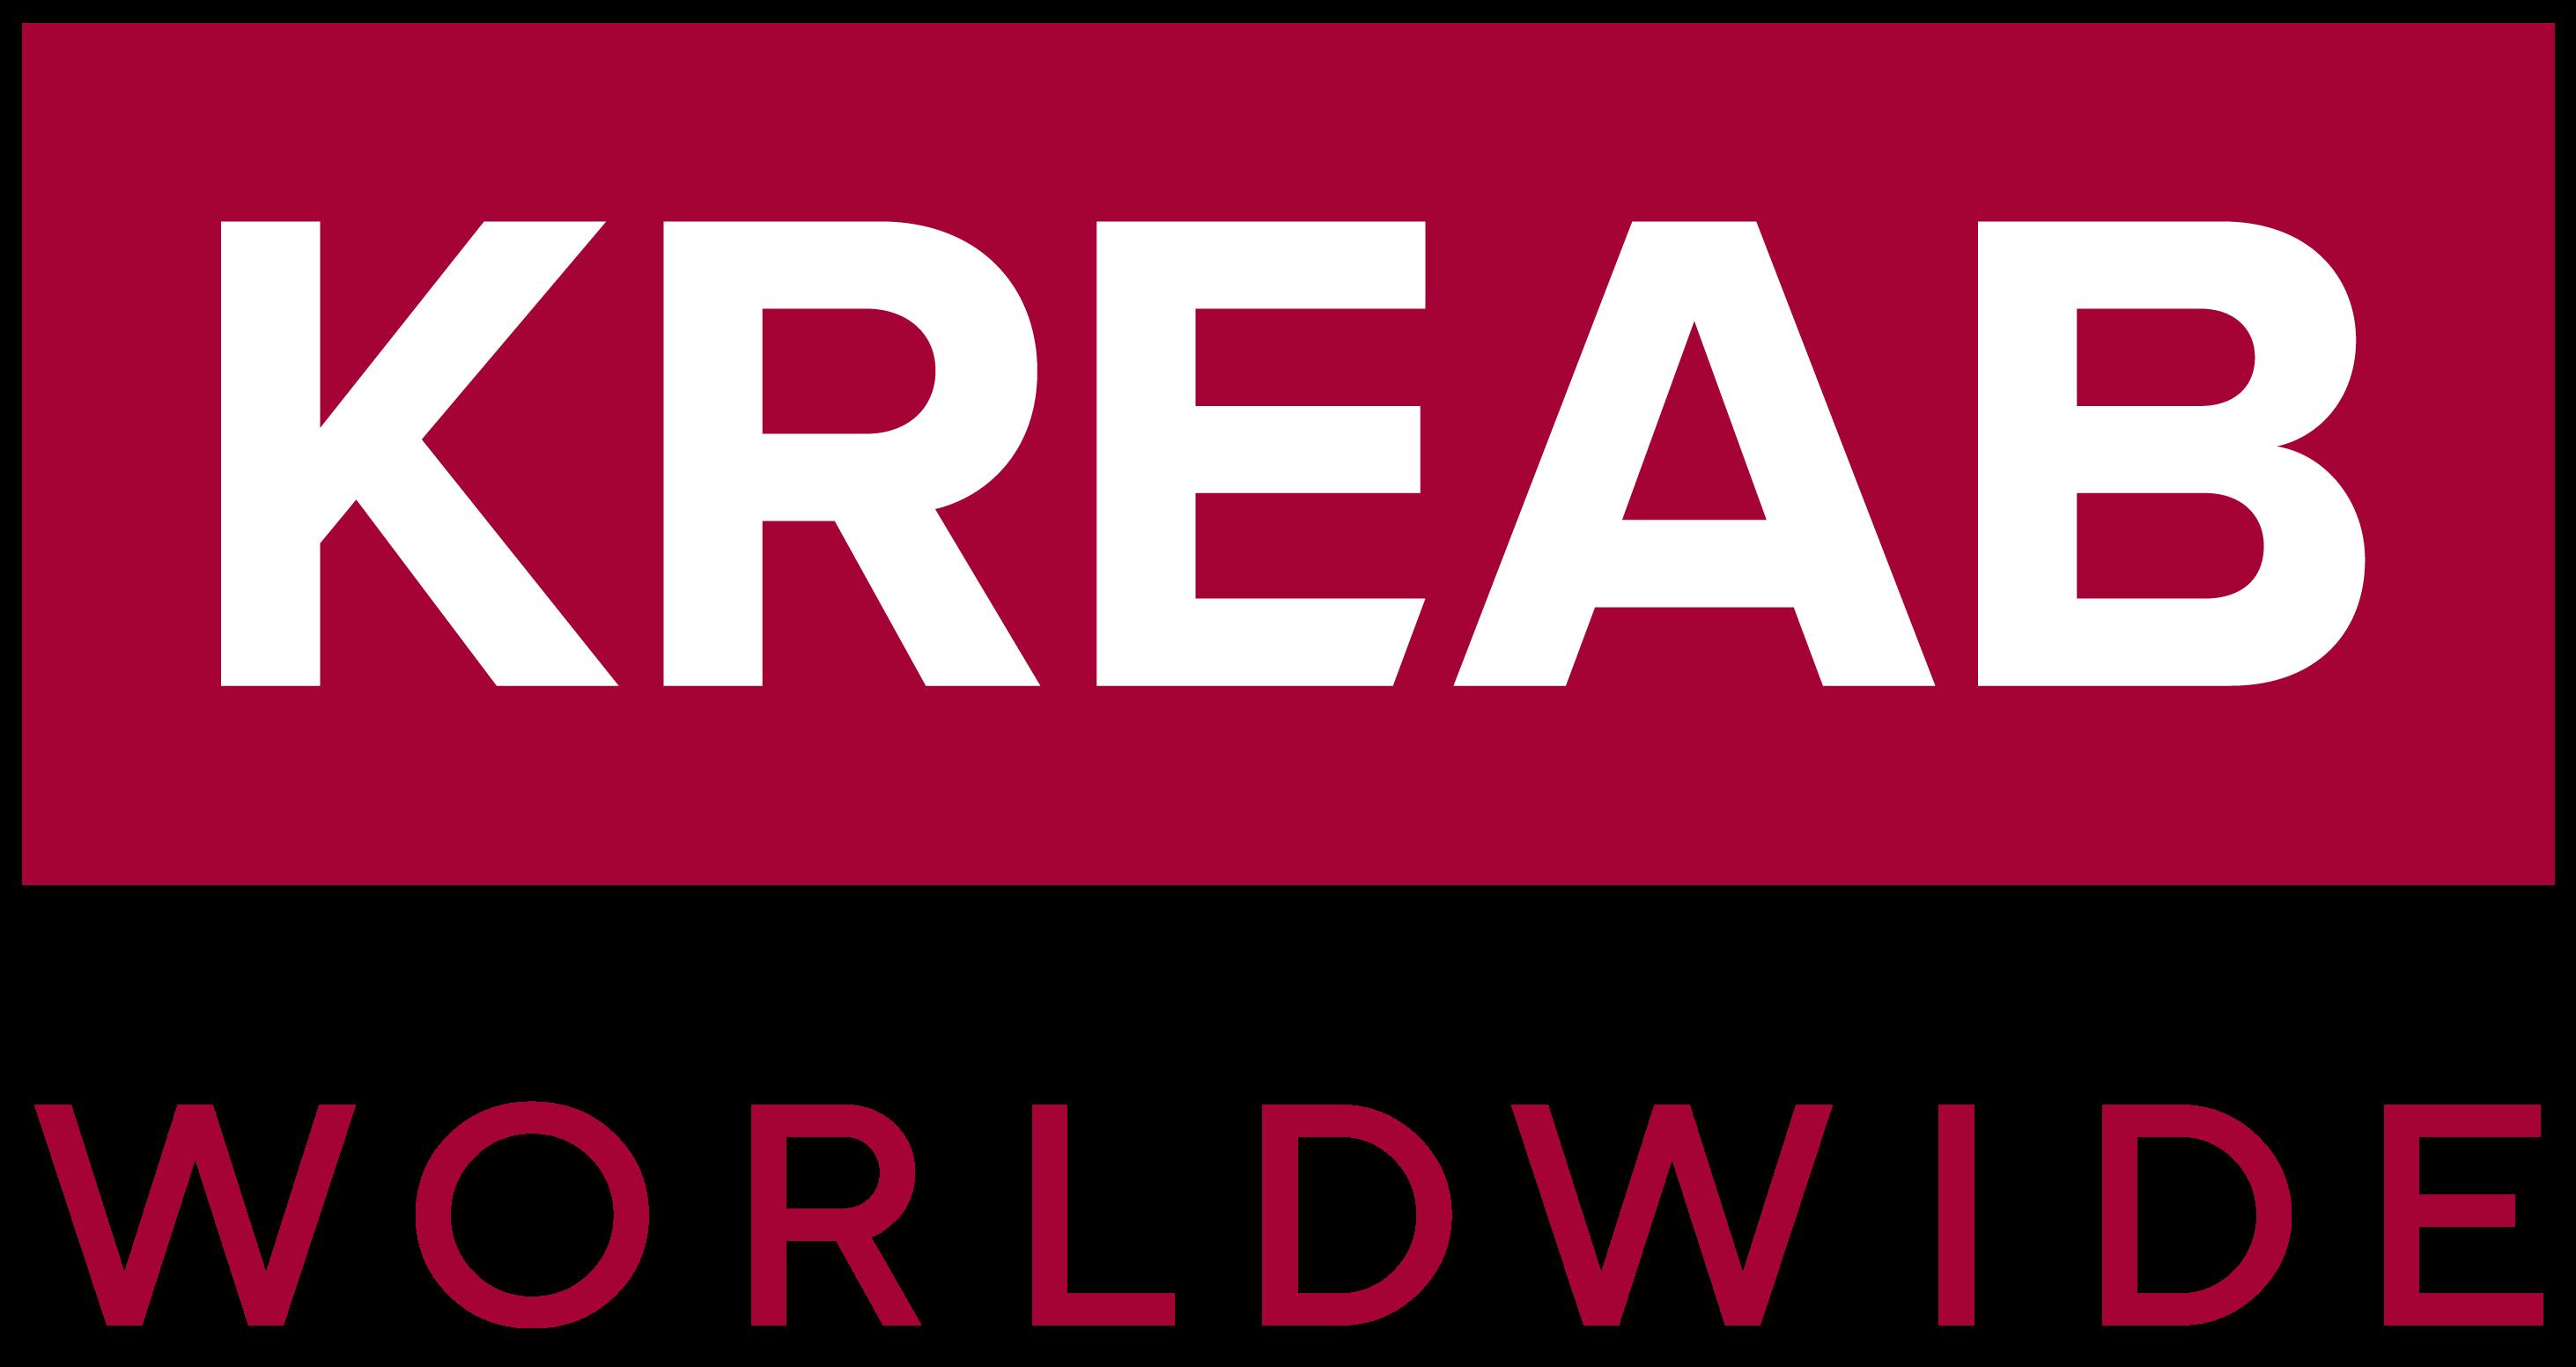 Logotipo Kreab Blog